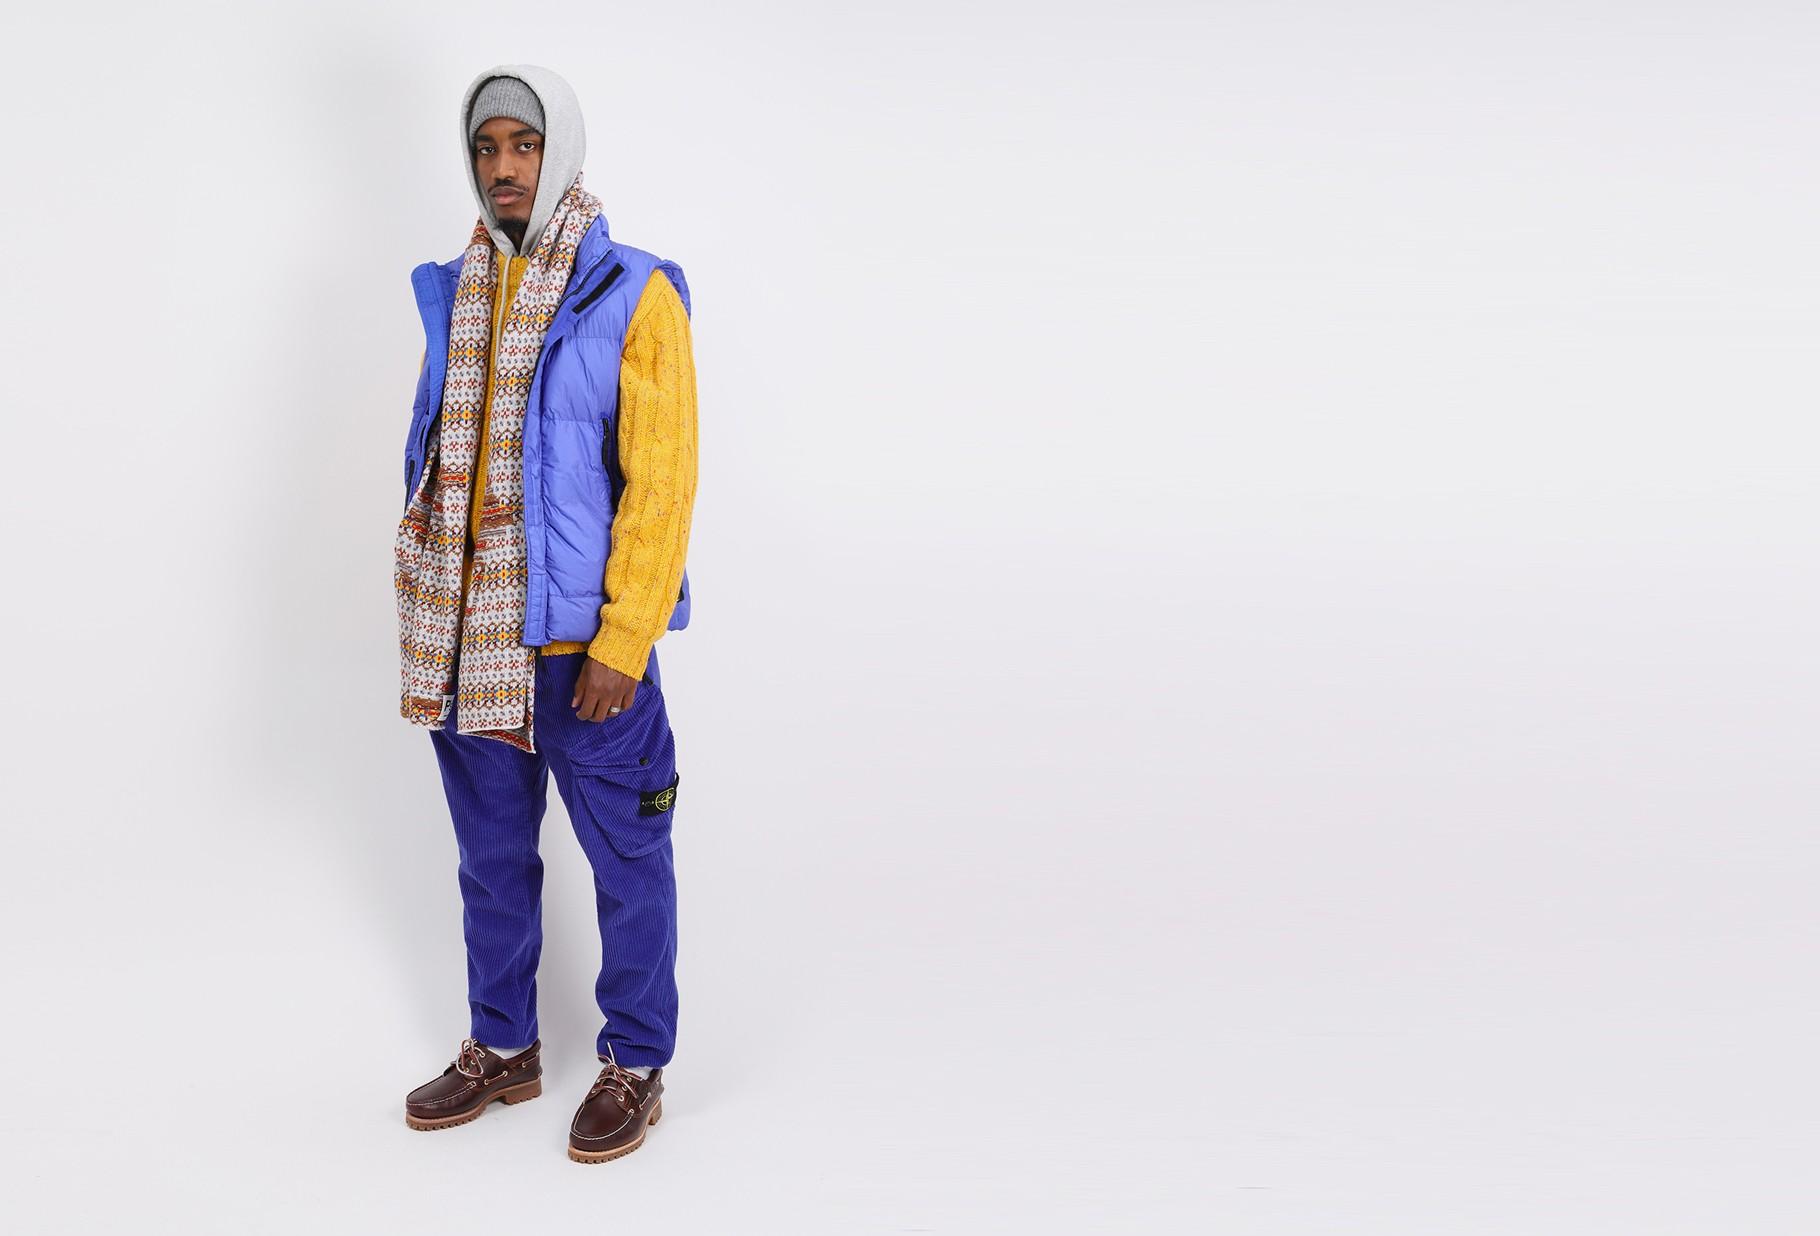 STONE ISLAND / G0123 sleeveless down jacket V0043 pervinca